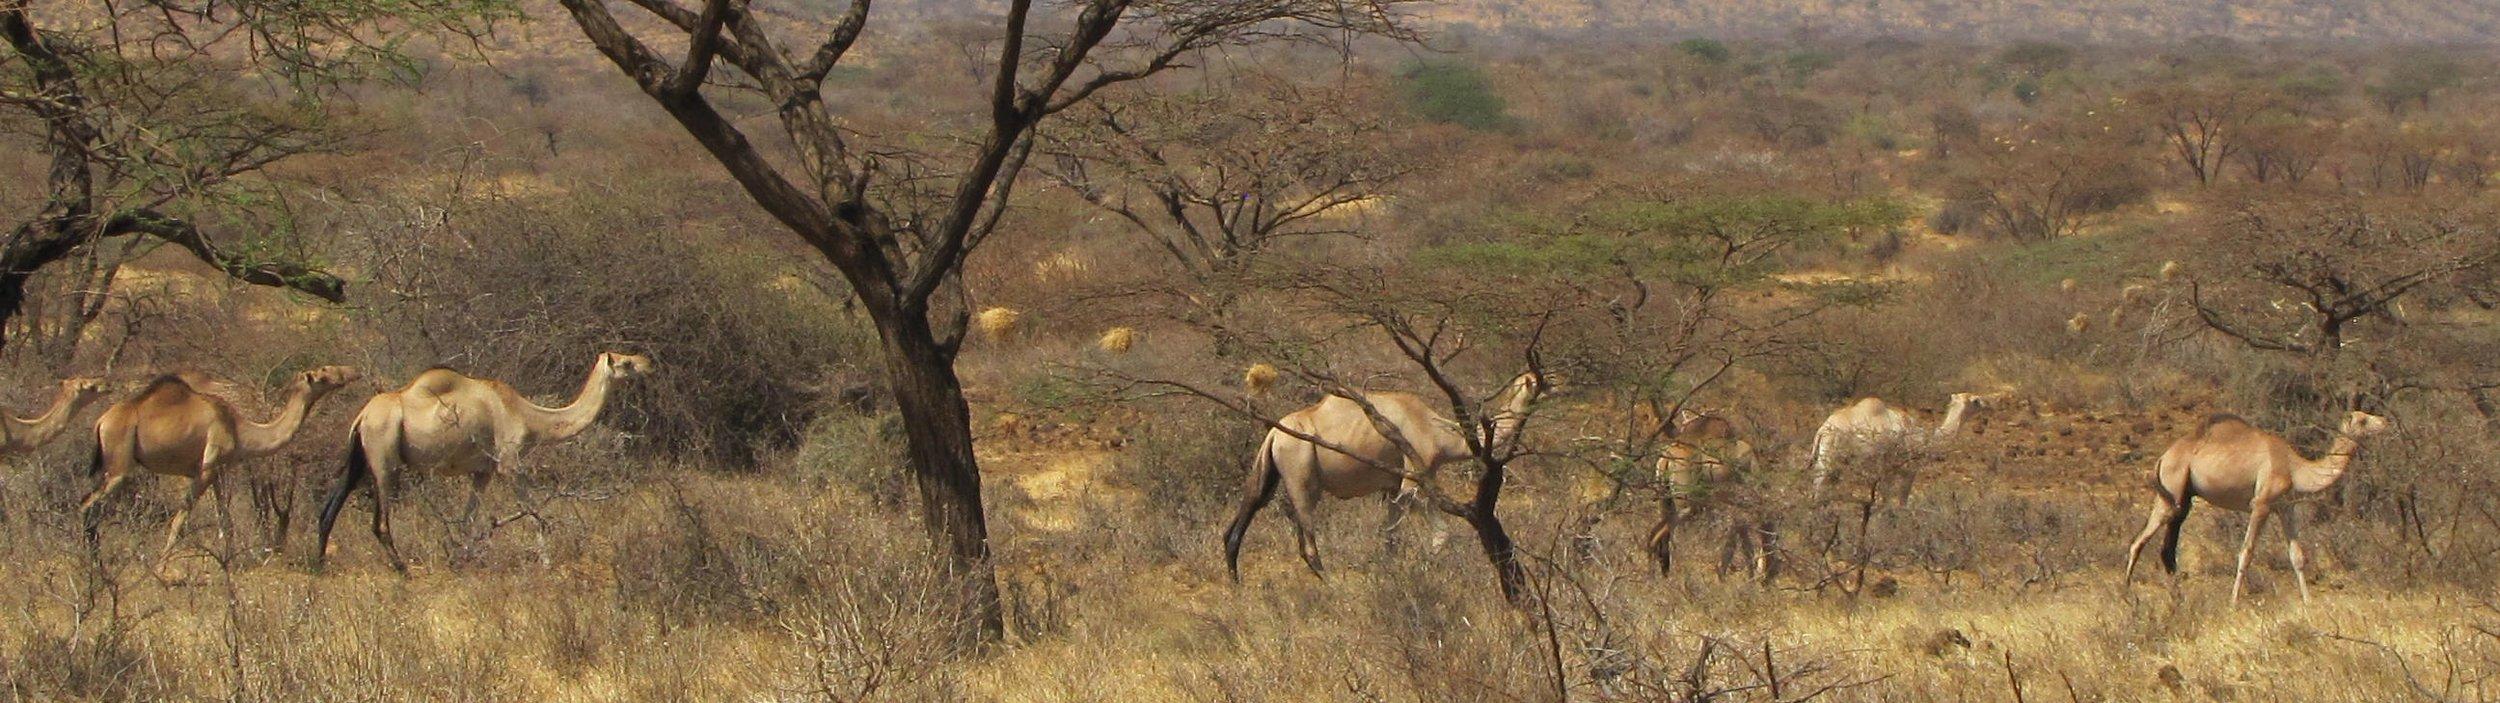 Camels at Kachiuru